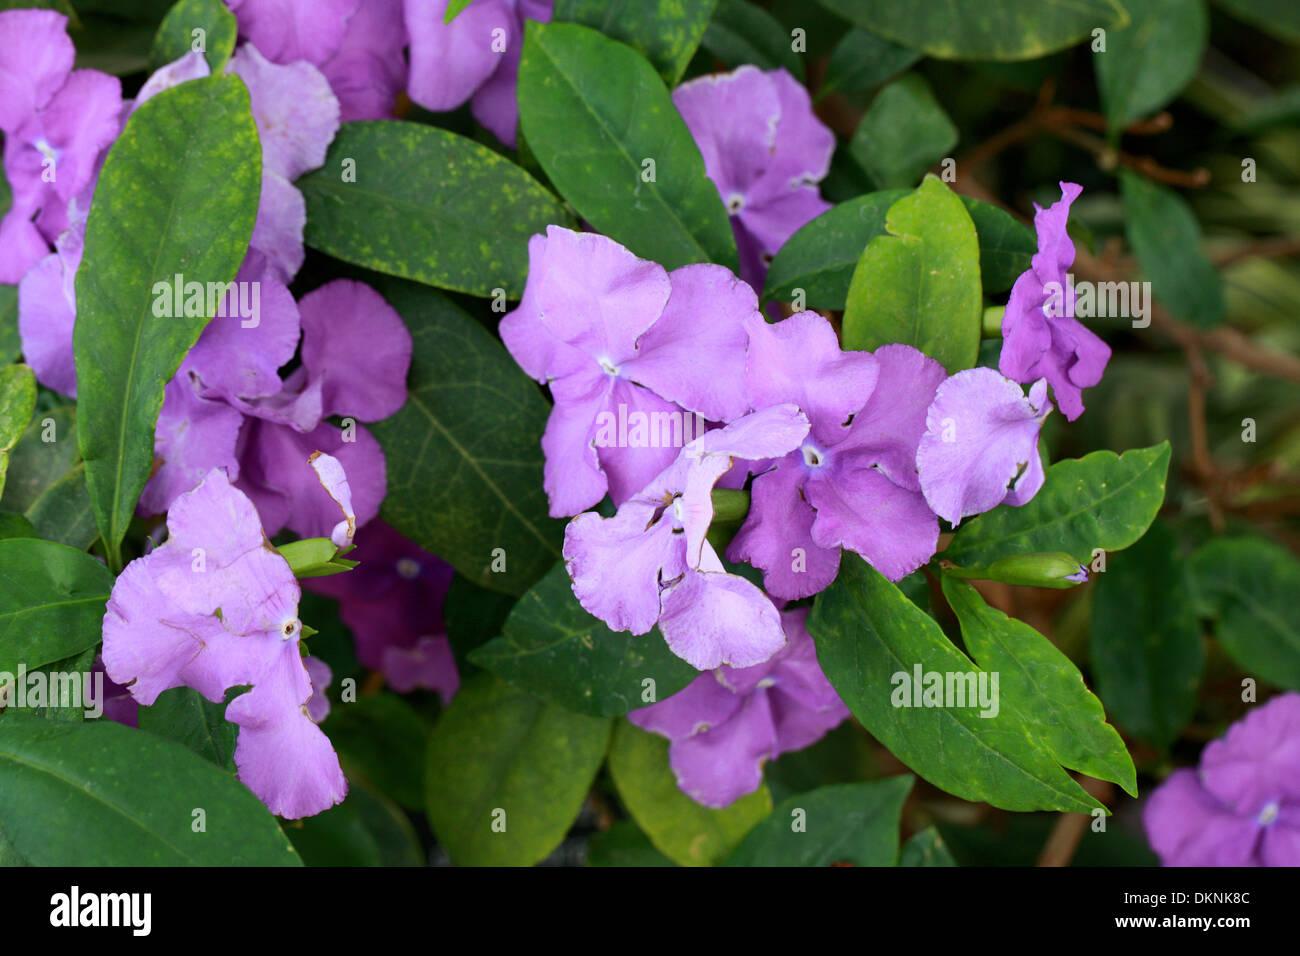 Yesterday, Today and Tomorrow Plant, Brunfelsia pauciflora 'Macrantha', Solanaceae. - Stock Image